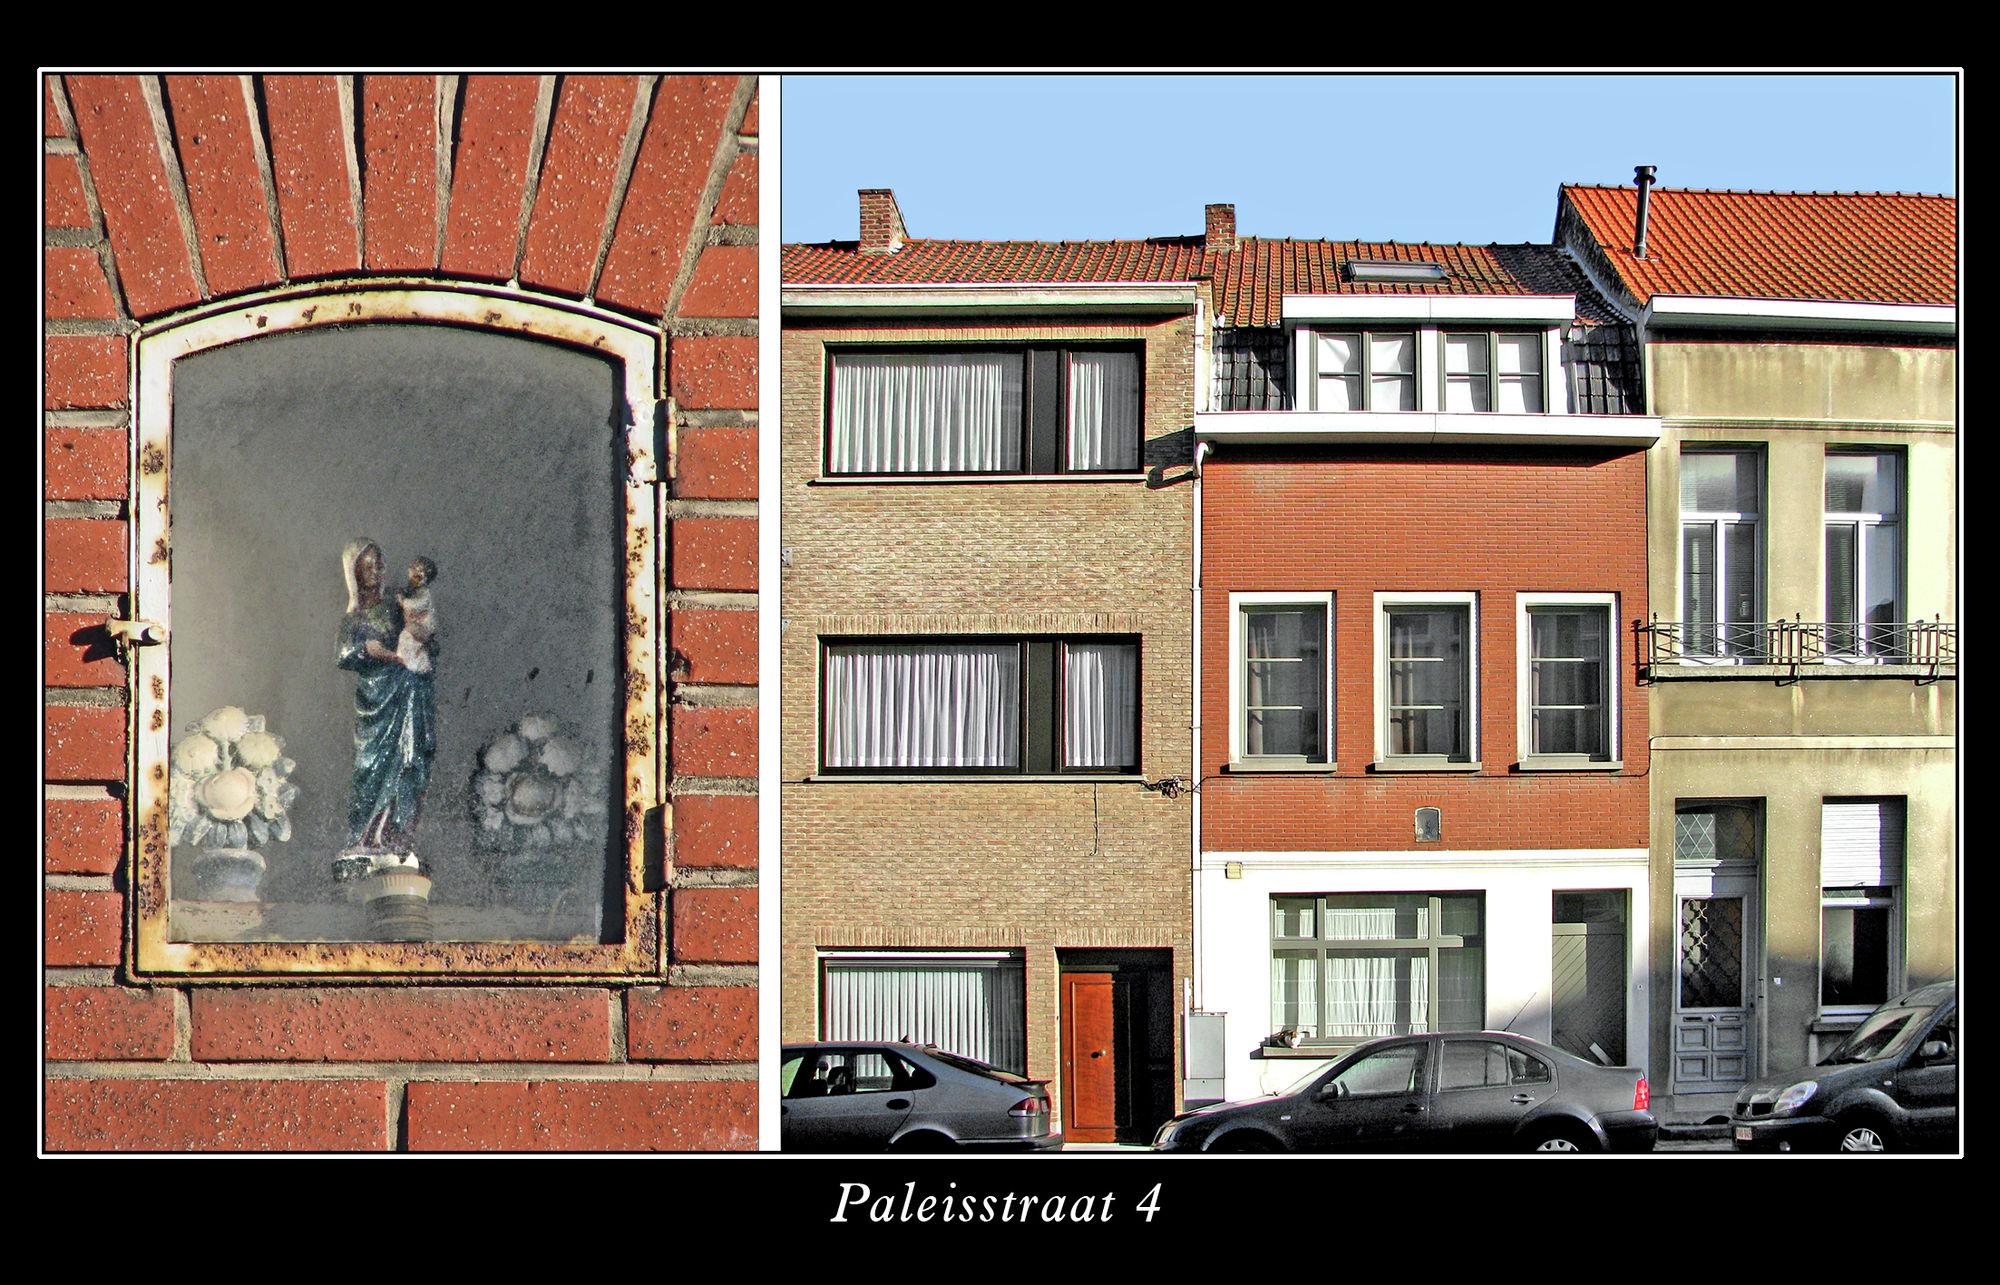 Muurkapel Paleisstraat